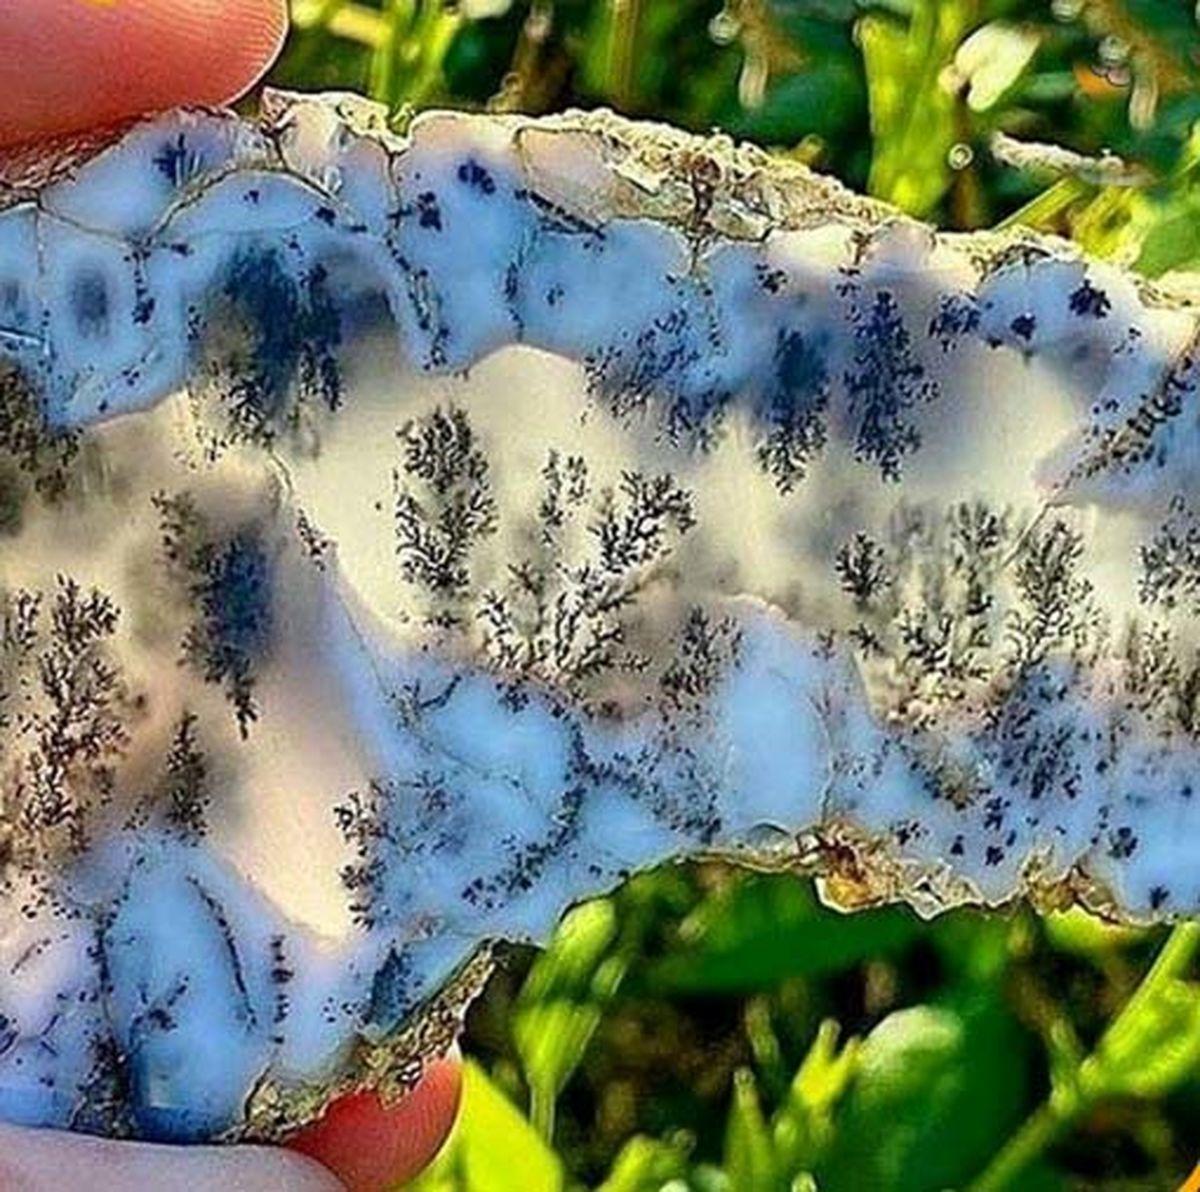 سنگ اُپالی شبیه به جنگل زمستانی